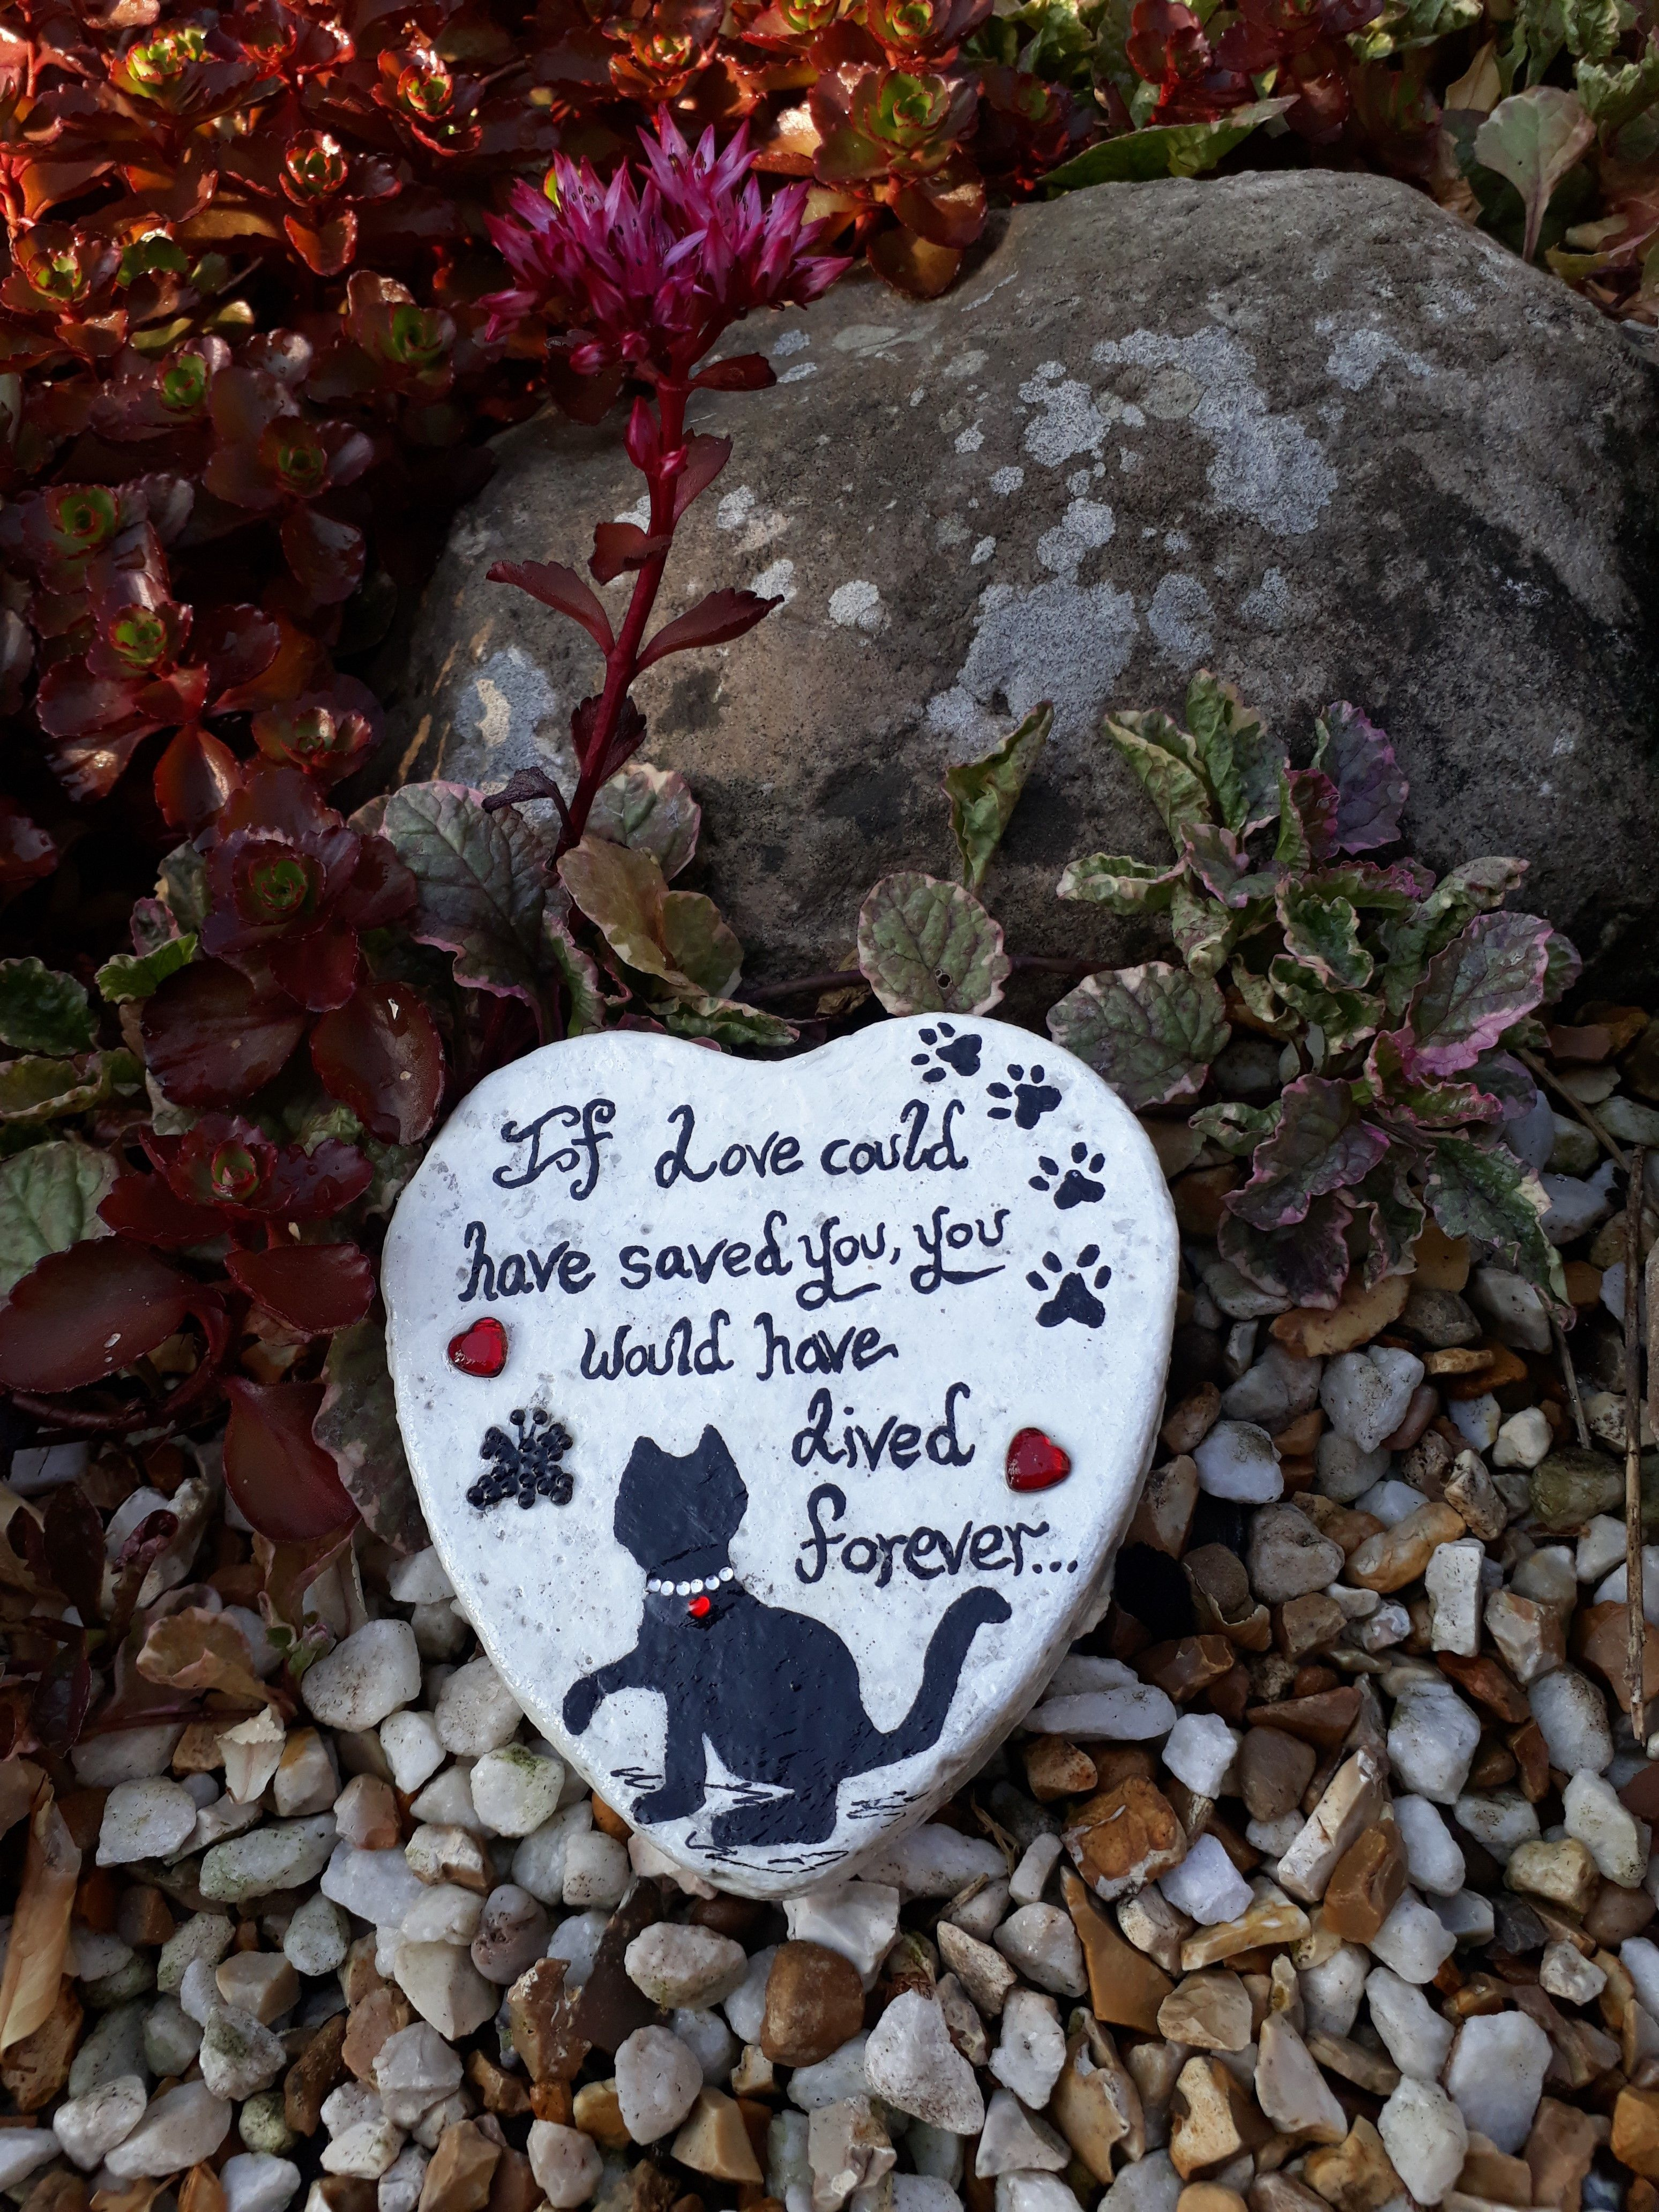 Cat memorial stone heart shape memorial stone for loss of